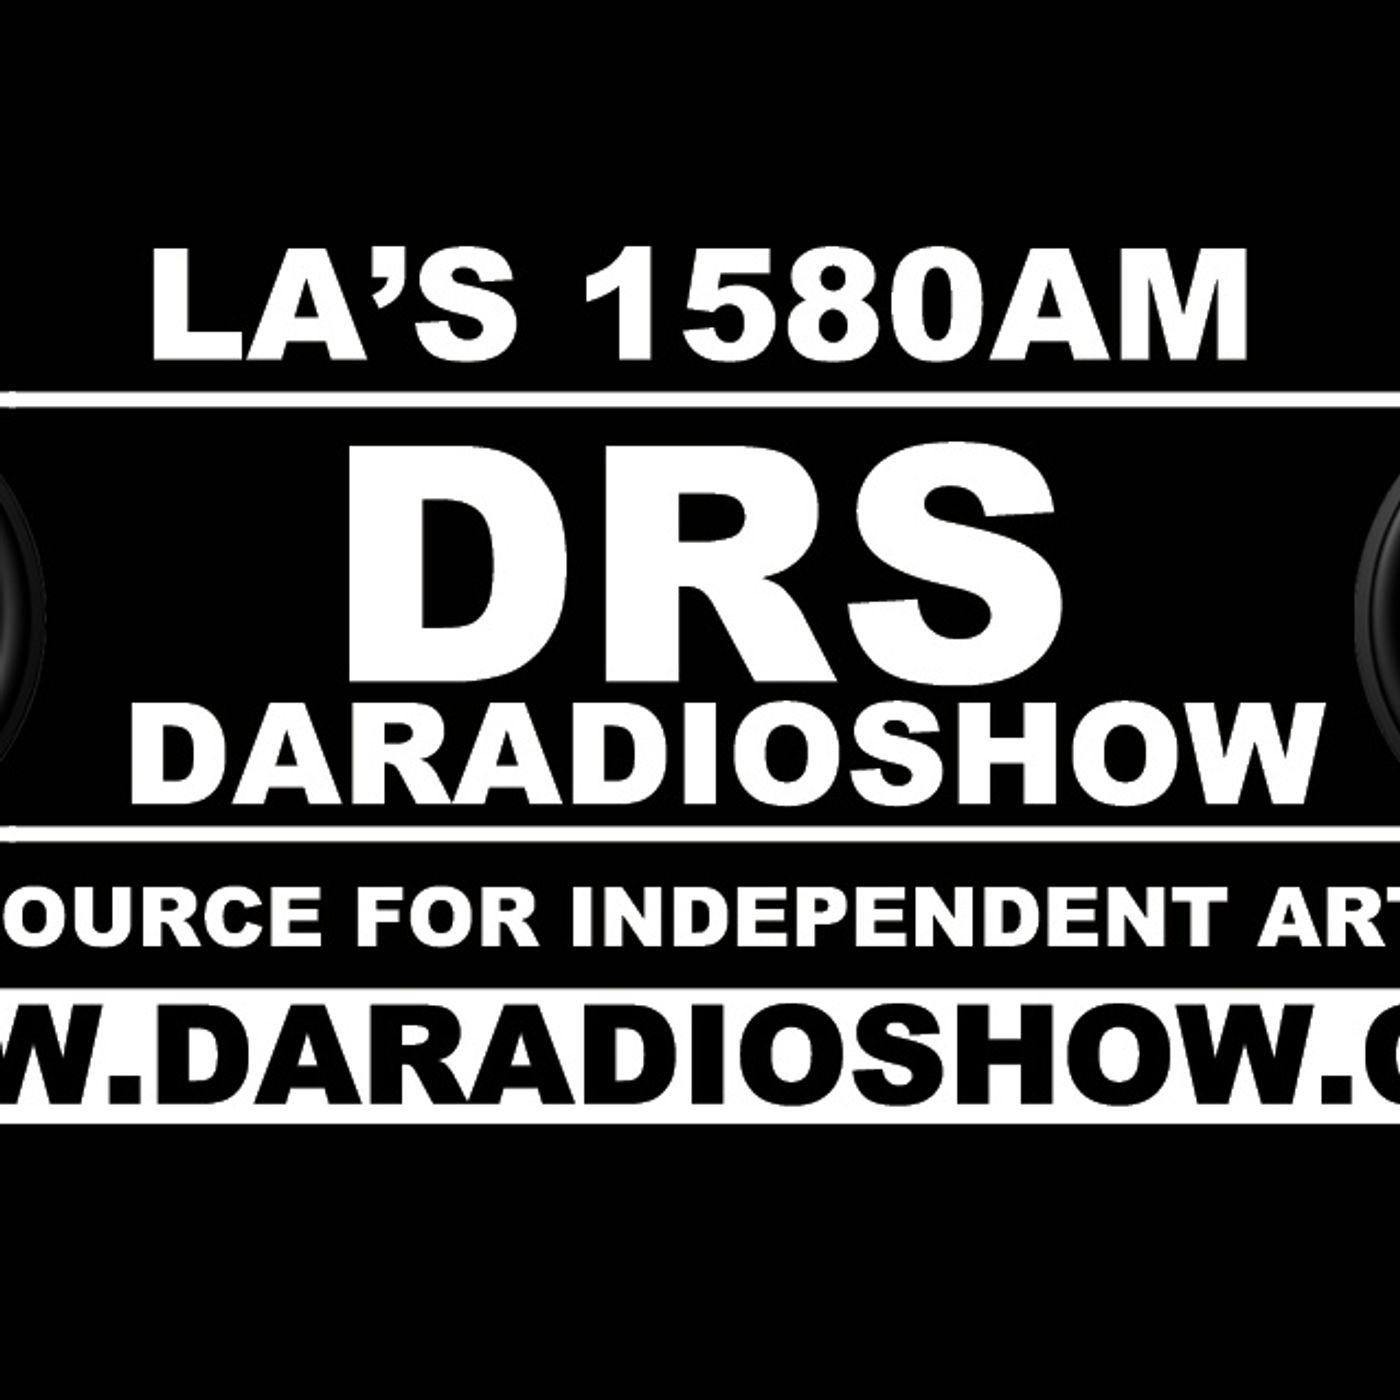 daradioshow